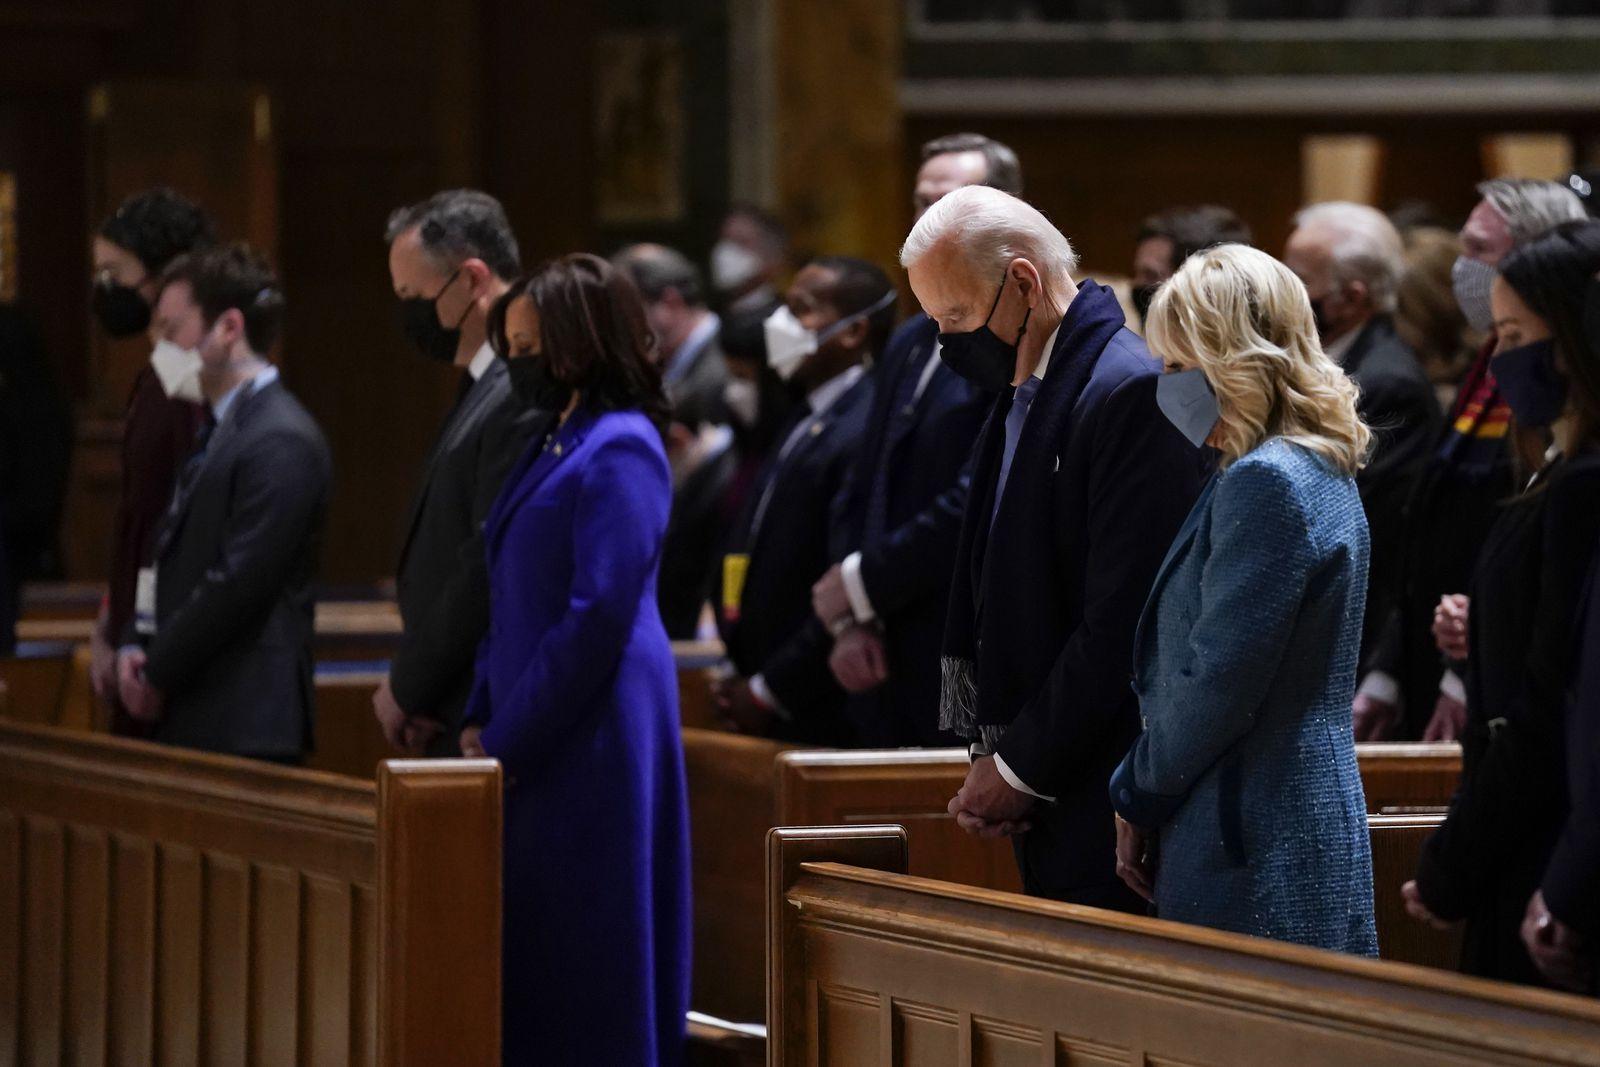 Photos: The inauguration of Joe Biden and Kamala Harris